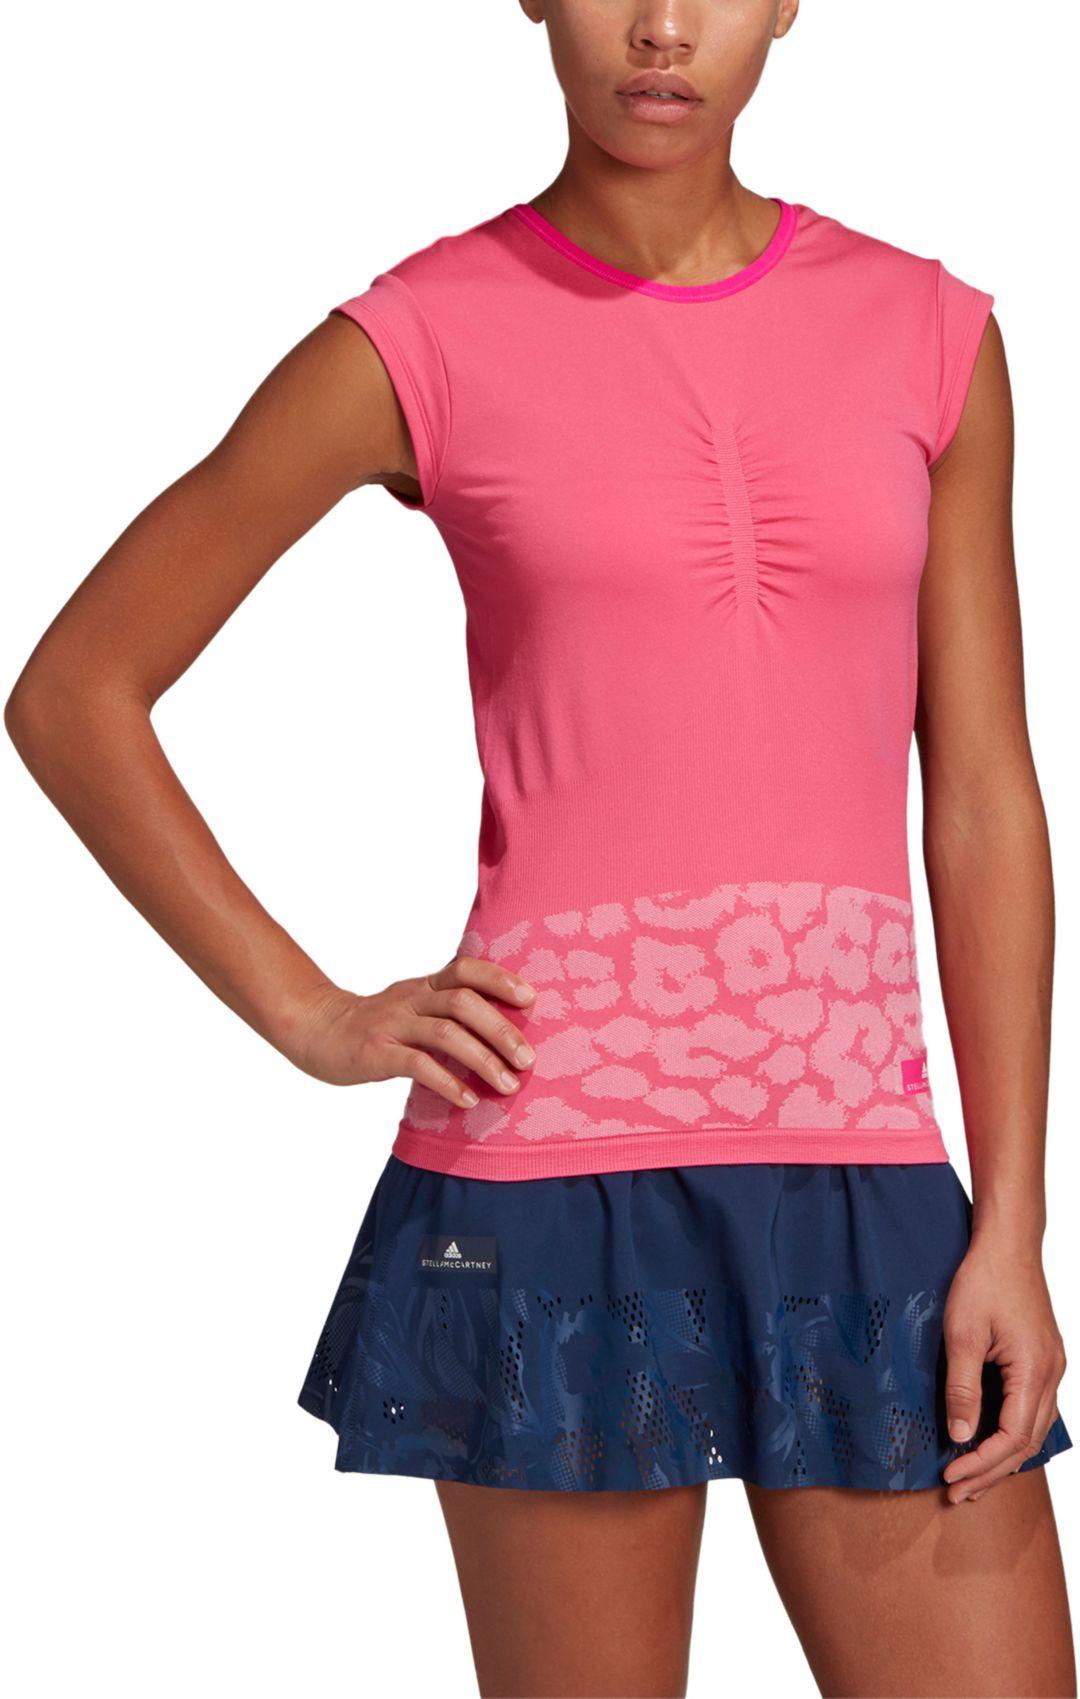 adidas Women's Stella McCartney Leopard Print Tennis T Shirt